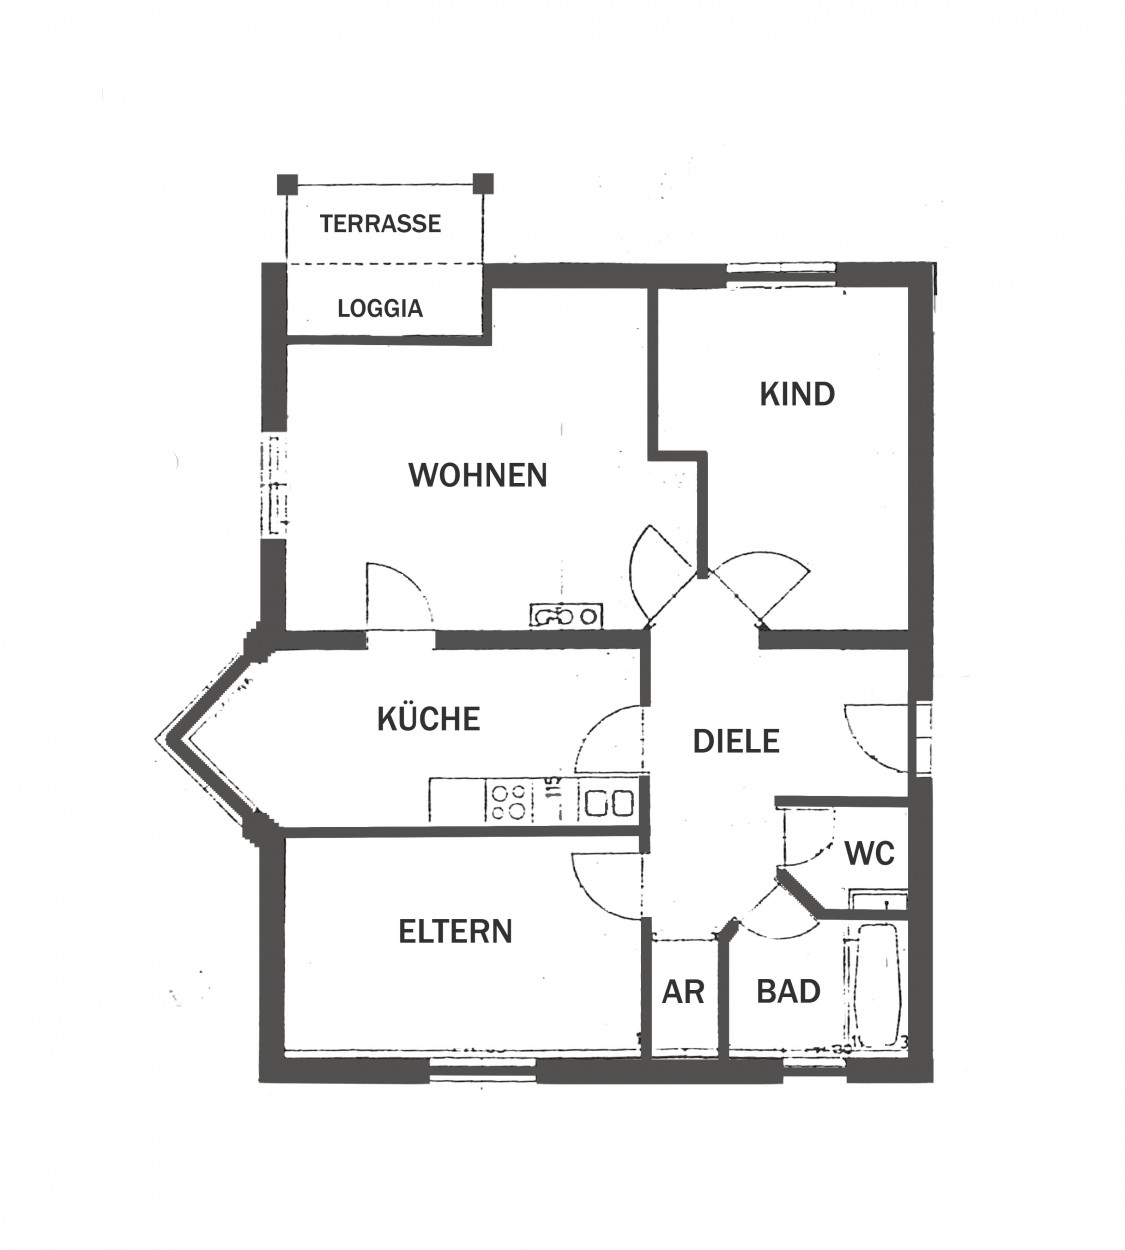 k stendorf tannerstra e1 top 4 salzburg wohnbau. Black Bedroom Furniture Sets. Home Design Ideas